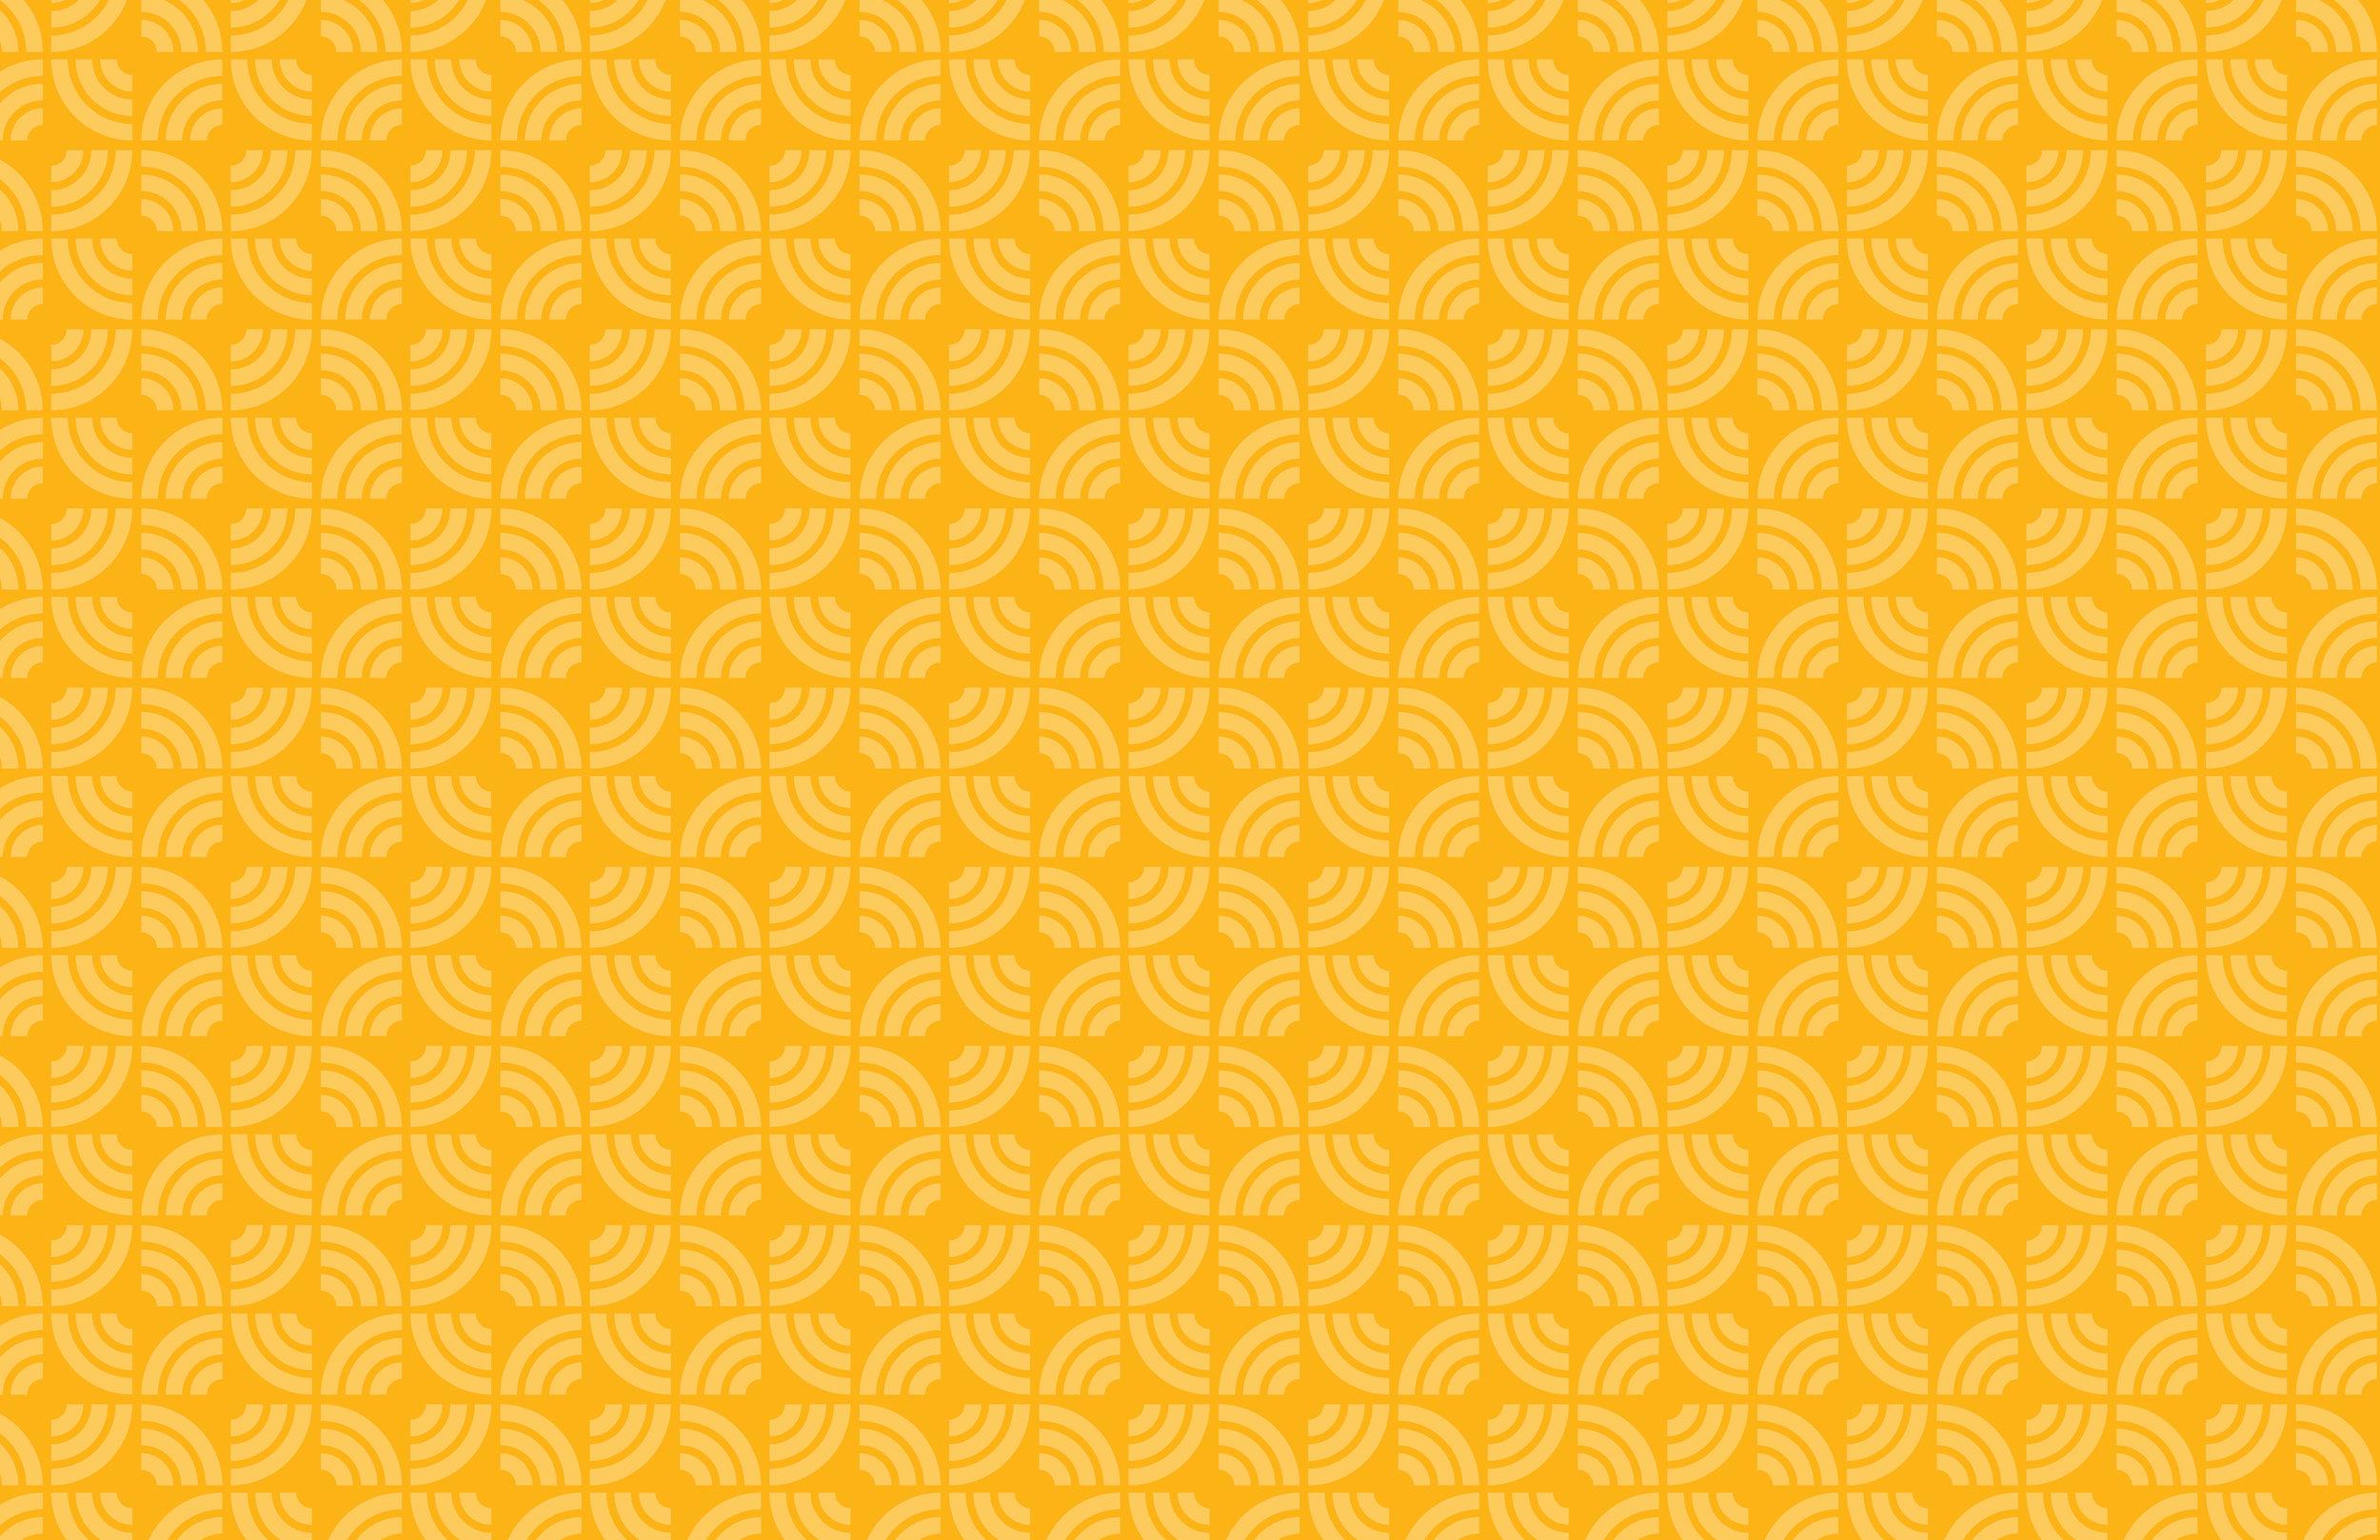 CommunityChords_Pattern_Soundwaves_Yellow.jpg